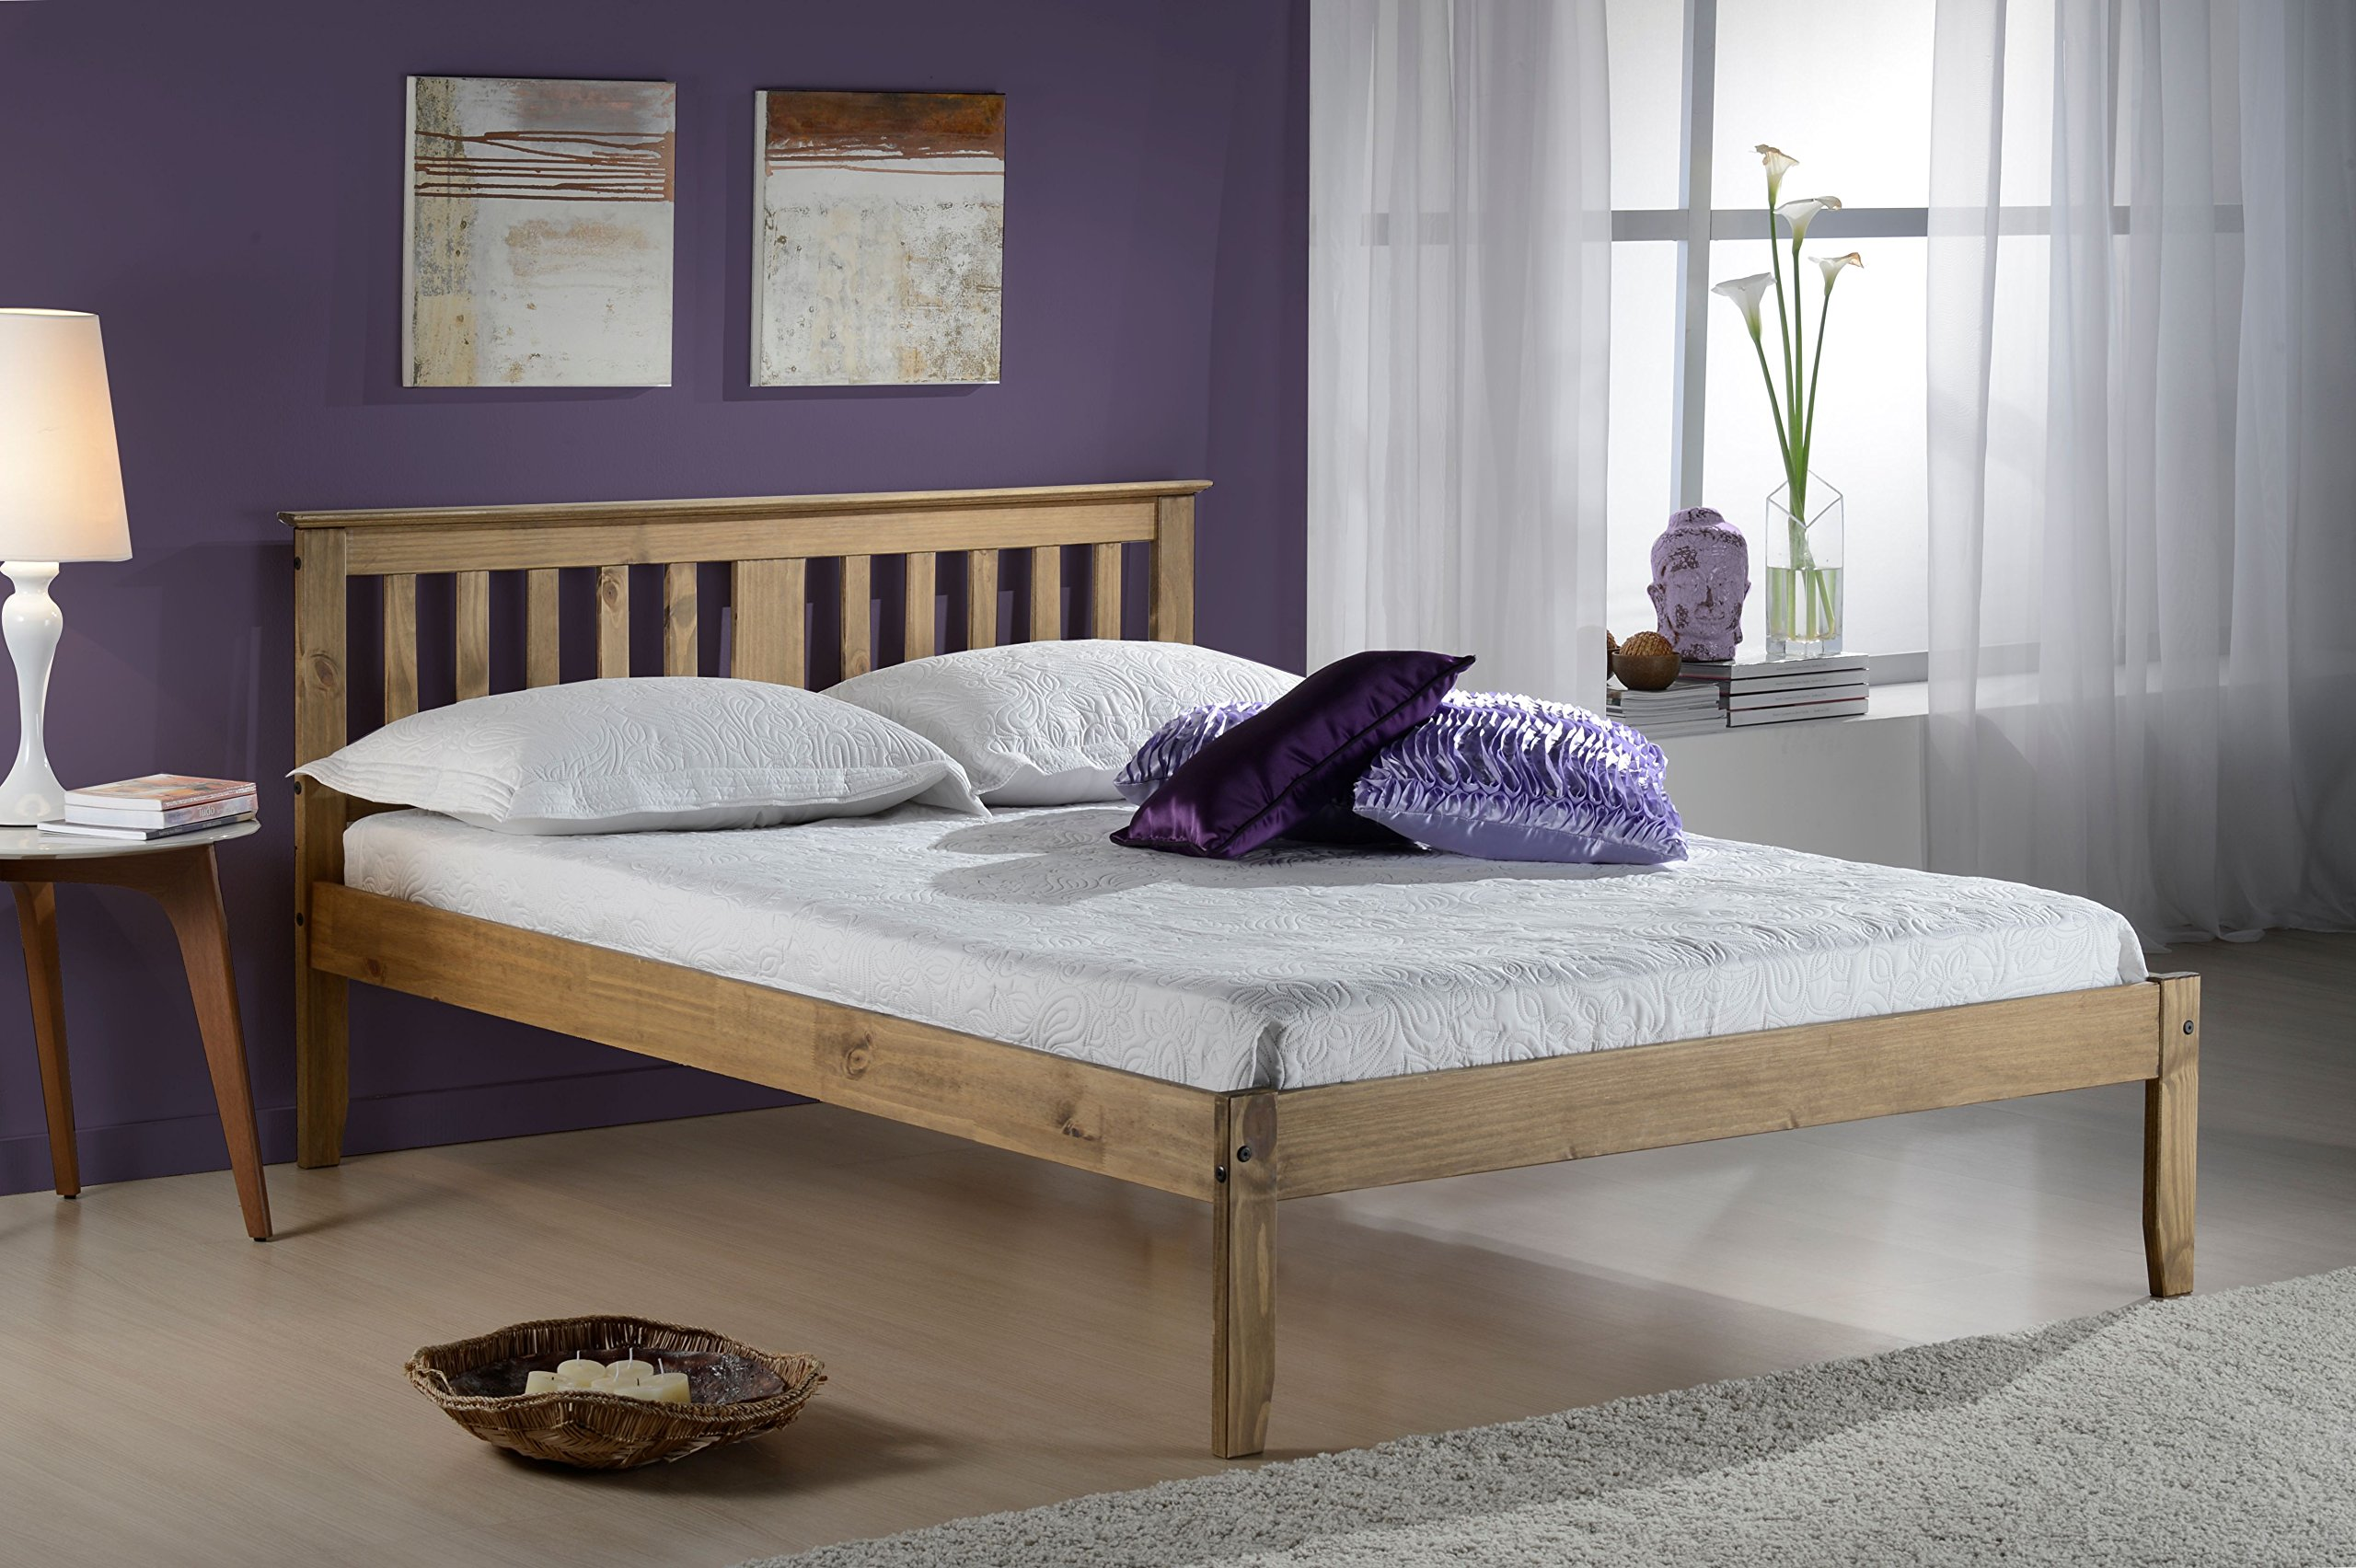 Oak Panana Classic Simple White Single Bed Frame 3FT Bedstead Solid Wood Children Kids Bedroom